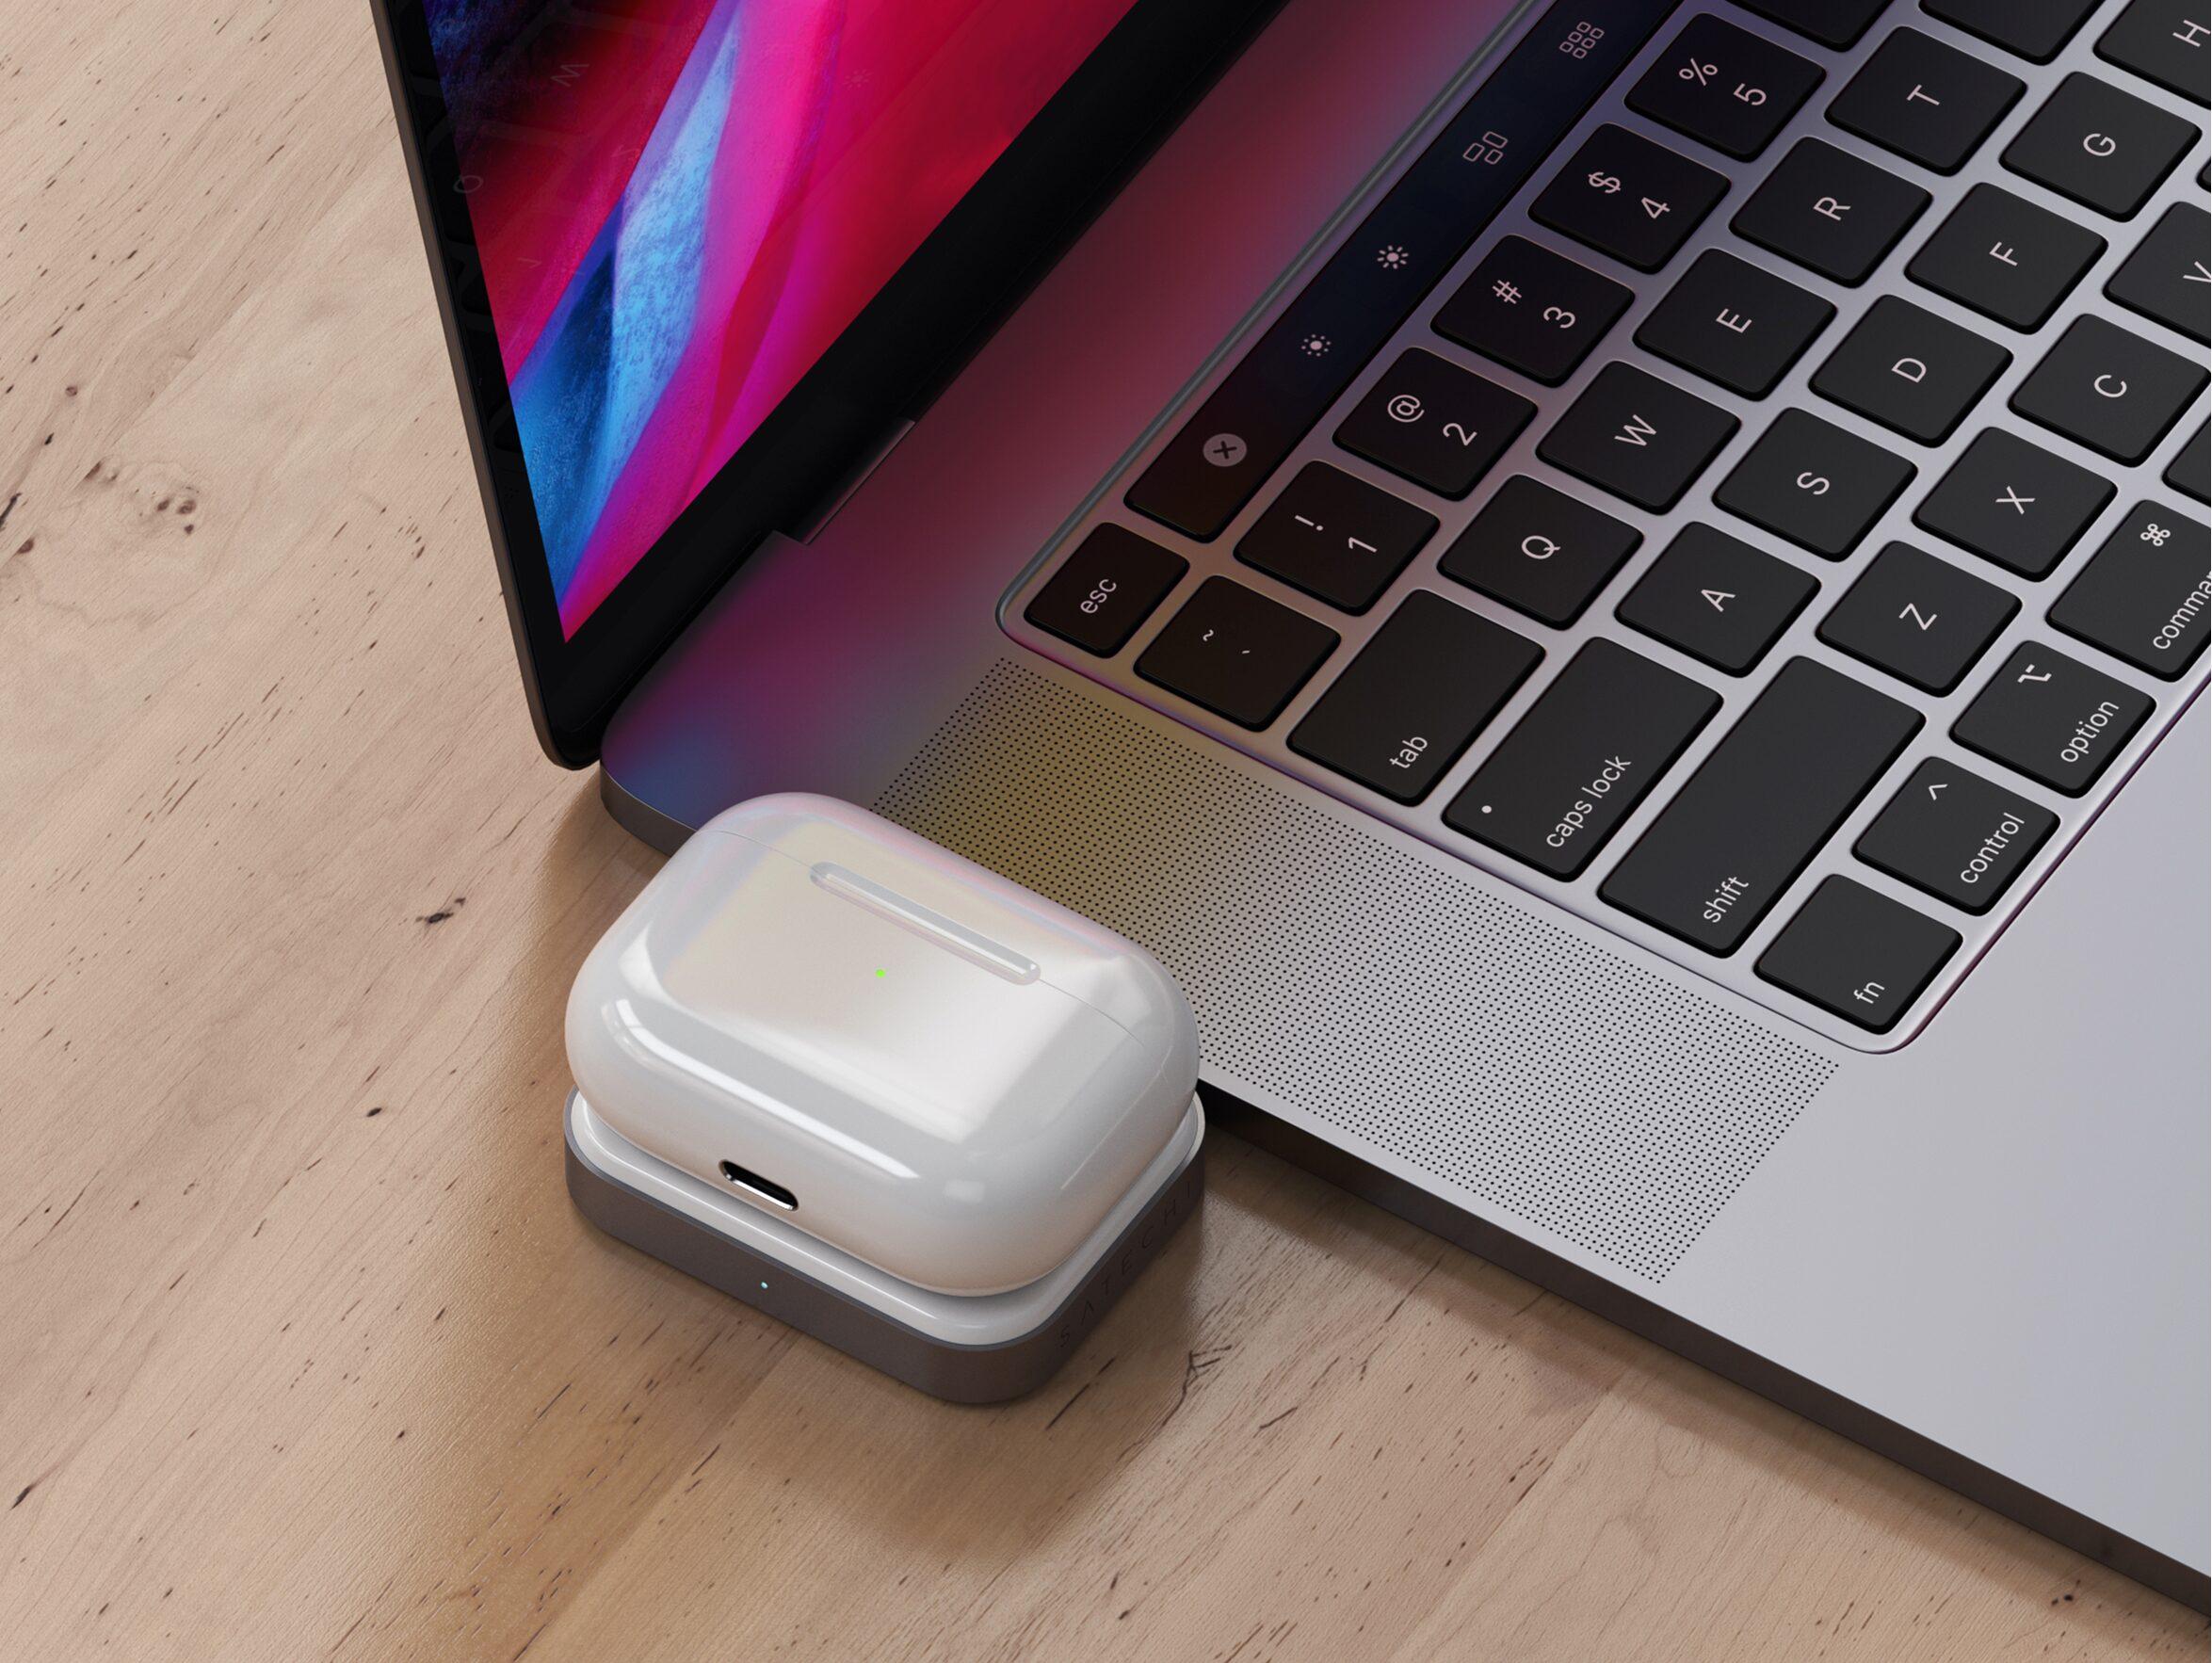 Satechi USB C Wireless AirPods Dock